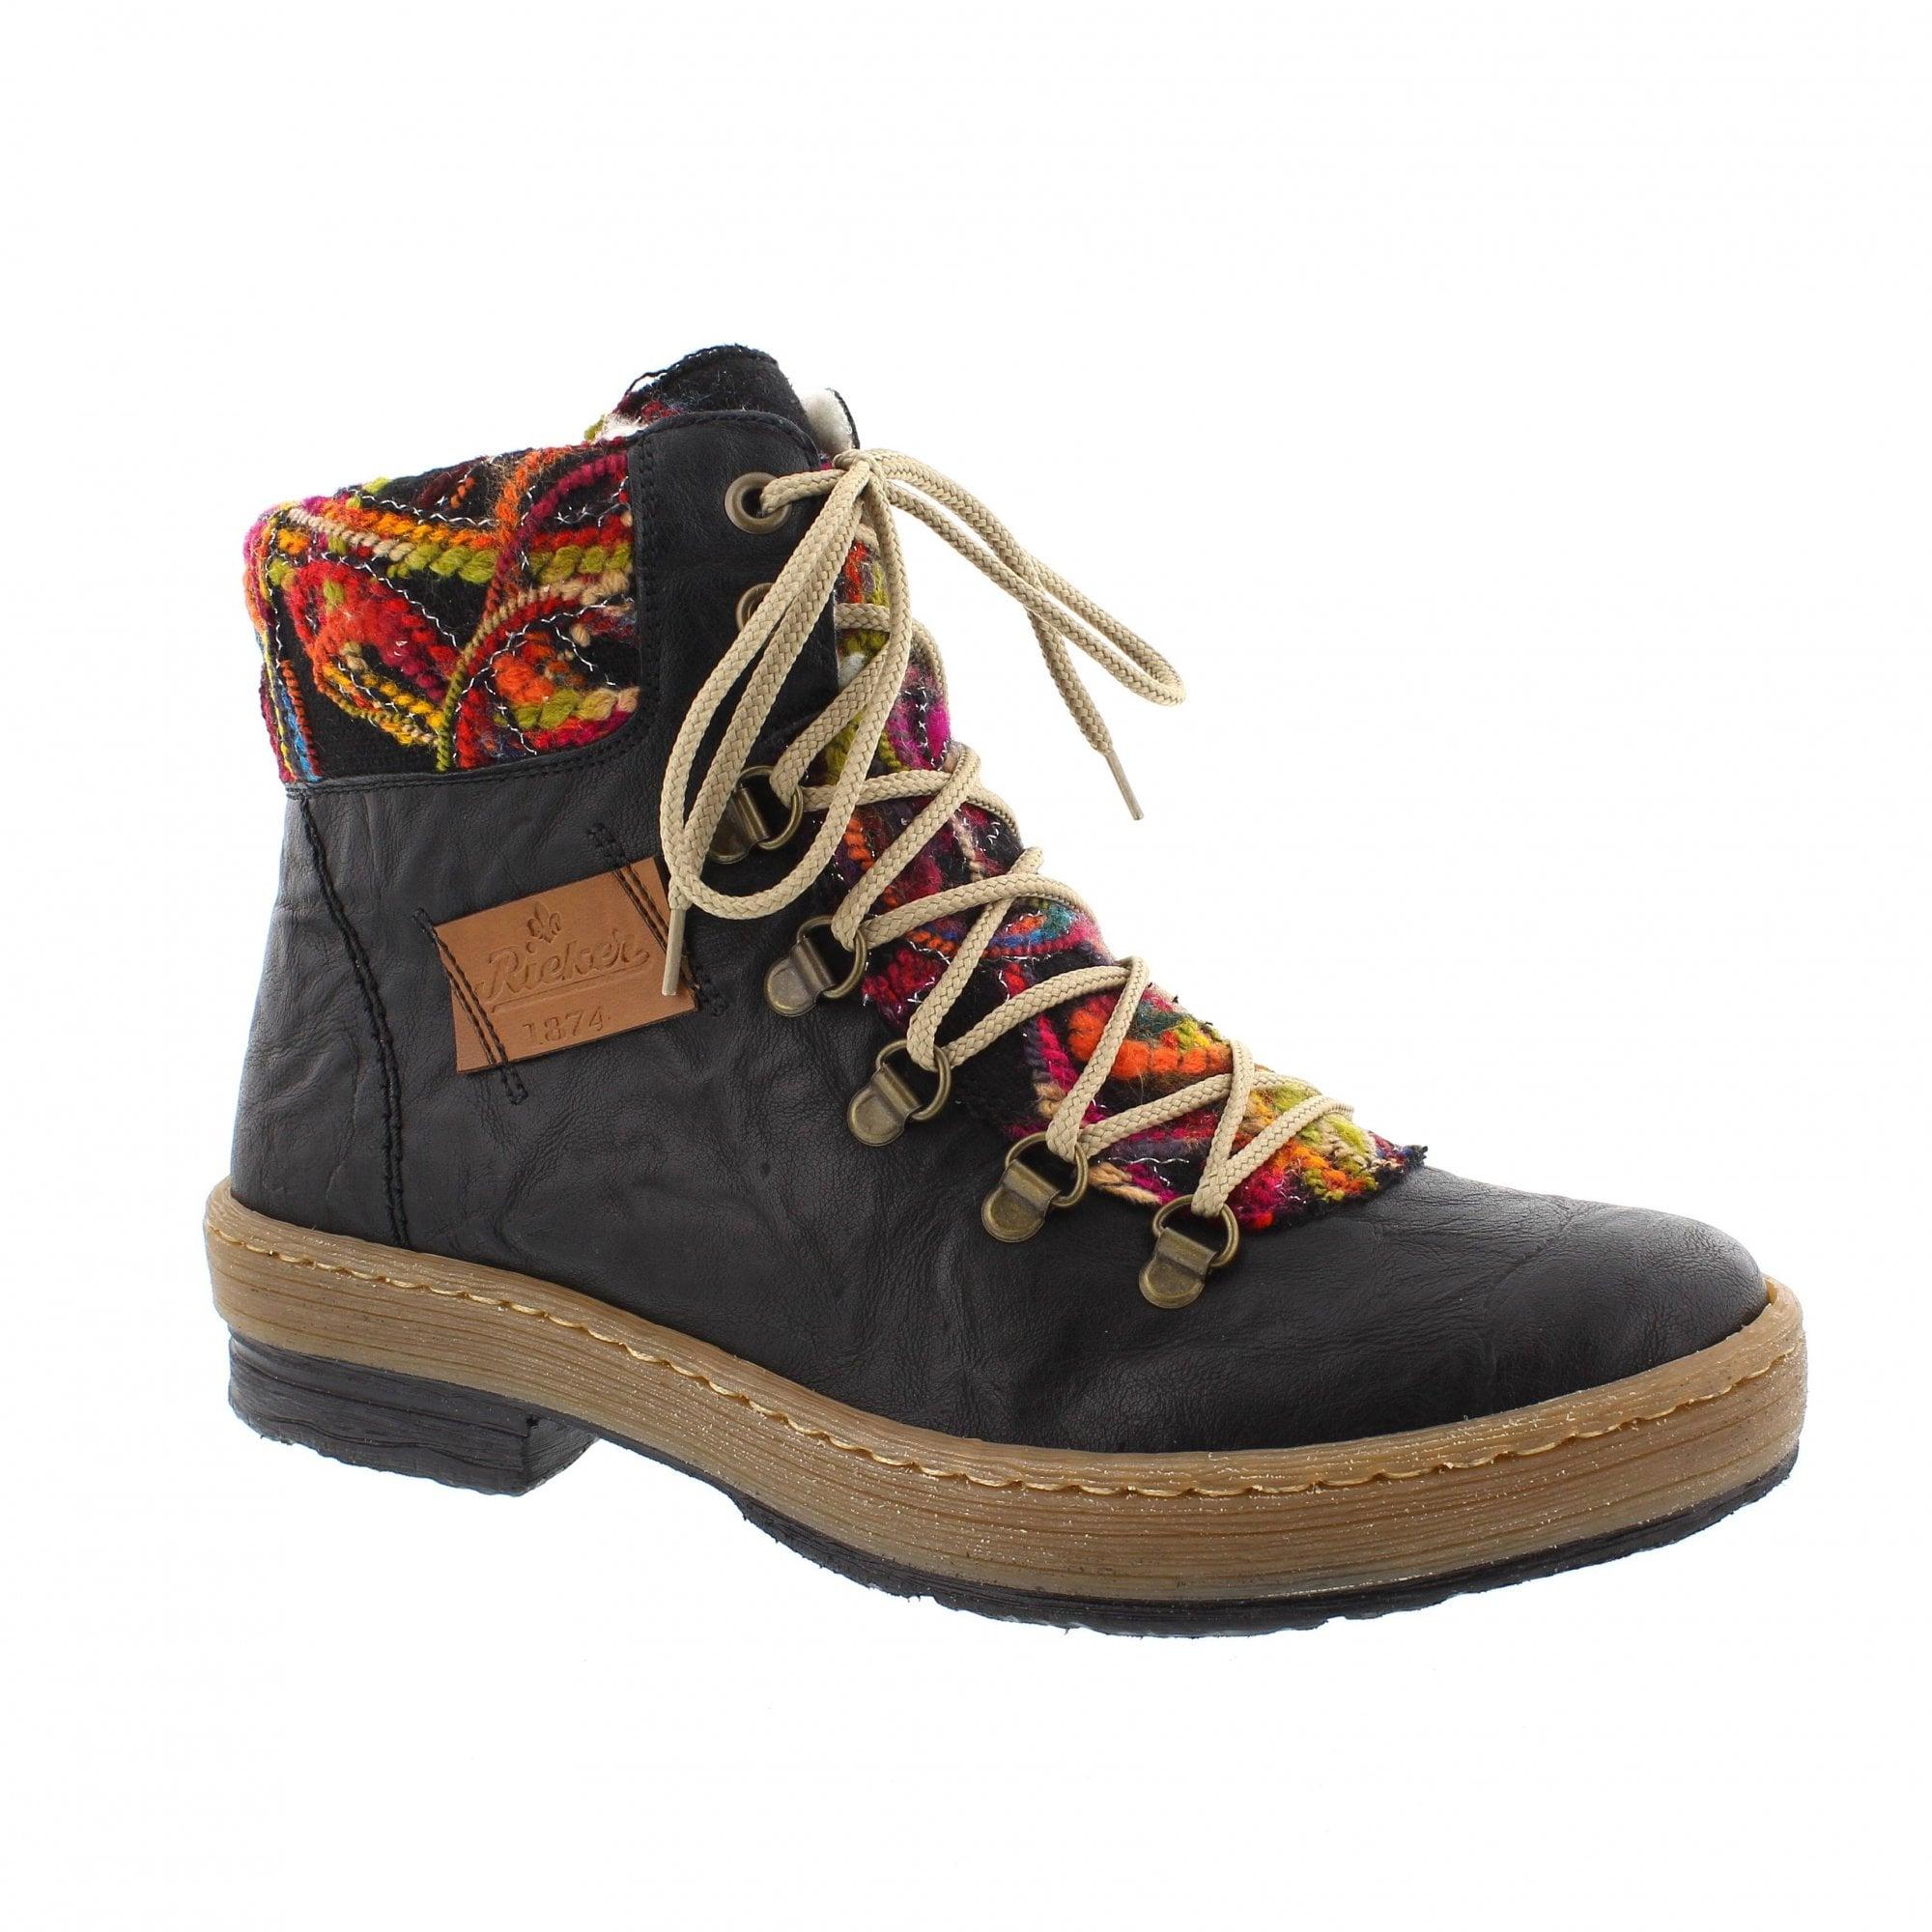 671c0fa773d23d Rieker Z6743-00 Black/Fuchsia Womens Warm Lined Ankle Boots ...